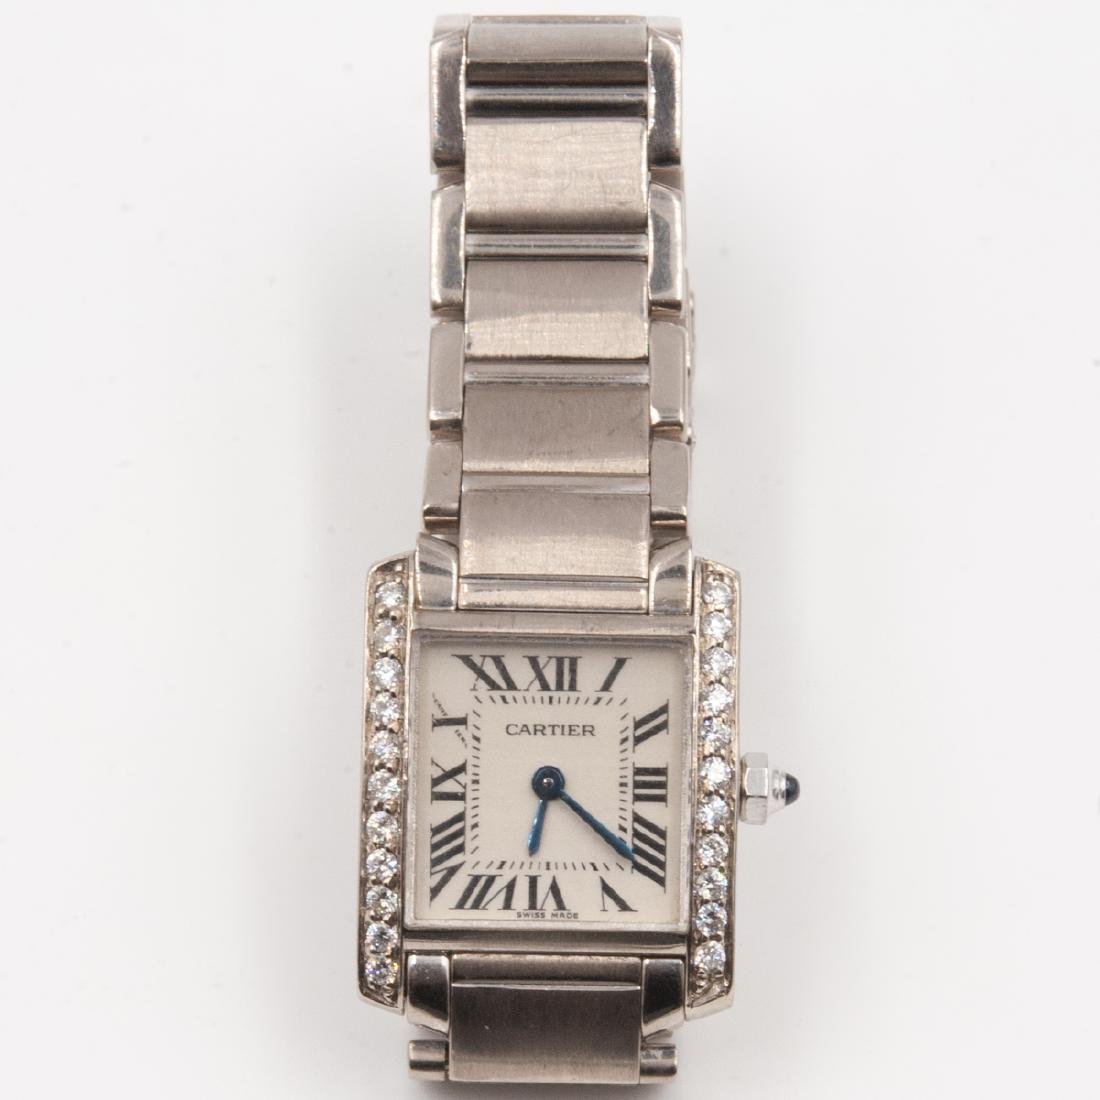 18k Gold Cartier Ladies Watch - 6